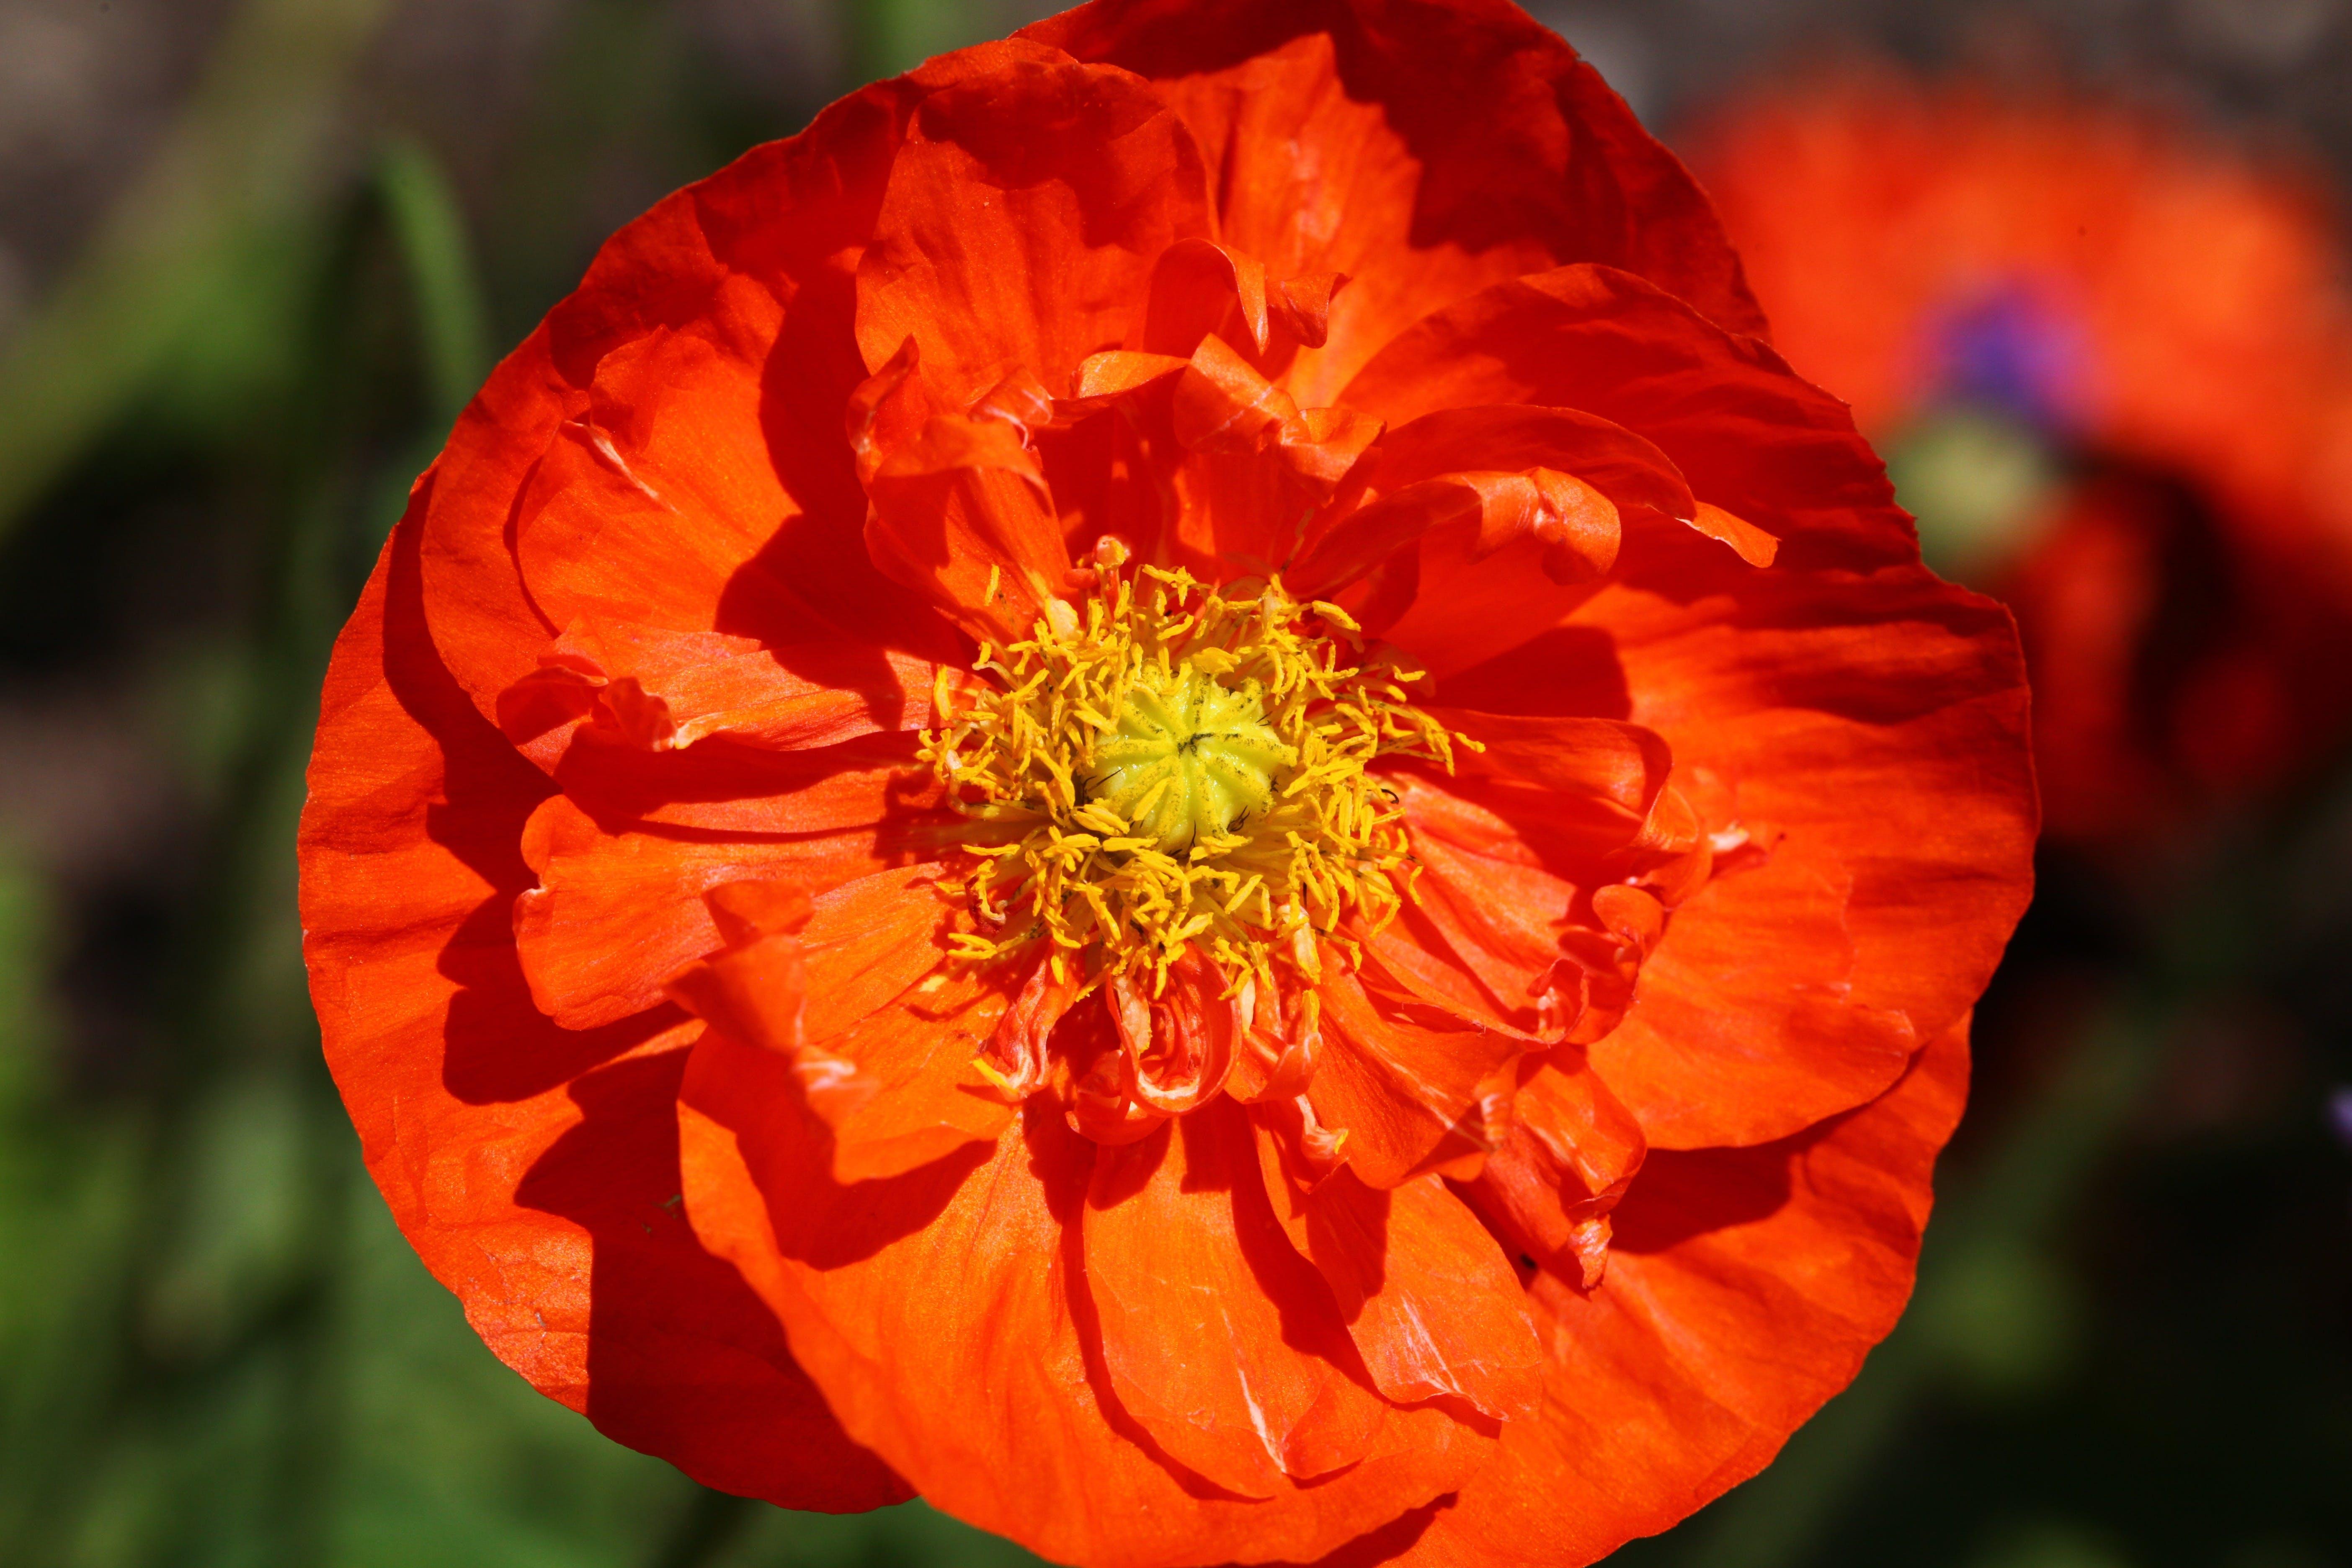 Orange Flower With Yellow Petals